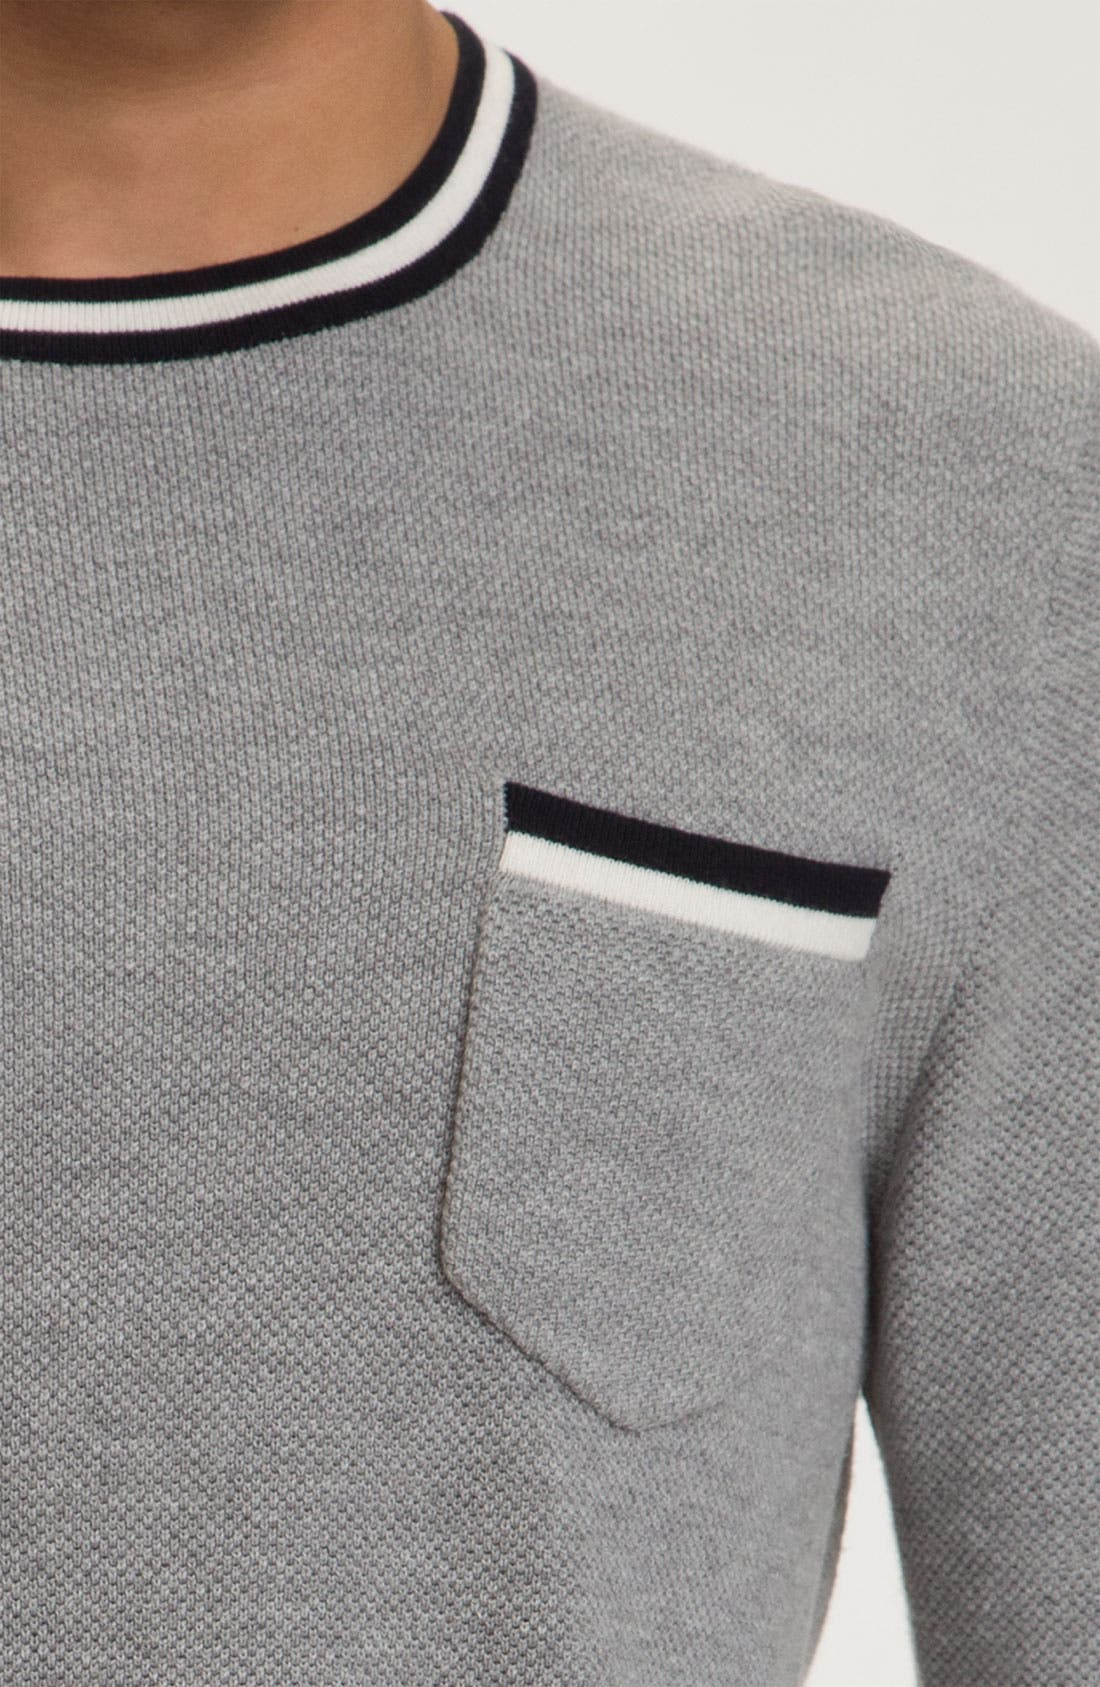 Alternate Image 3  - rag & bone 'Franklin' Crewneck Sweater